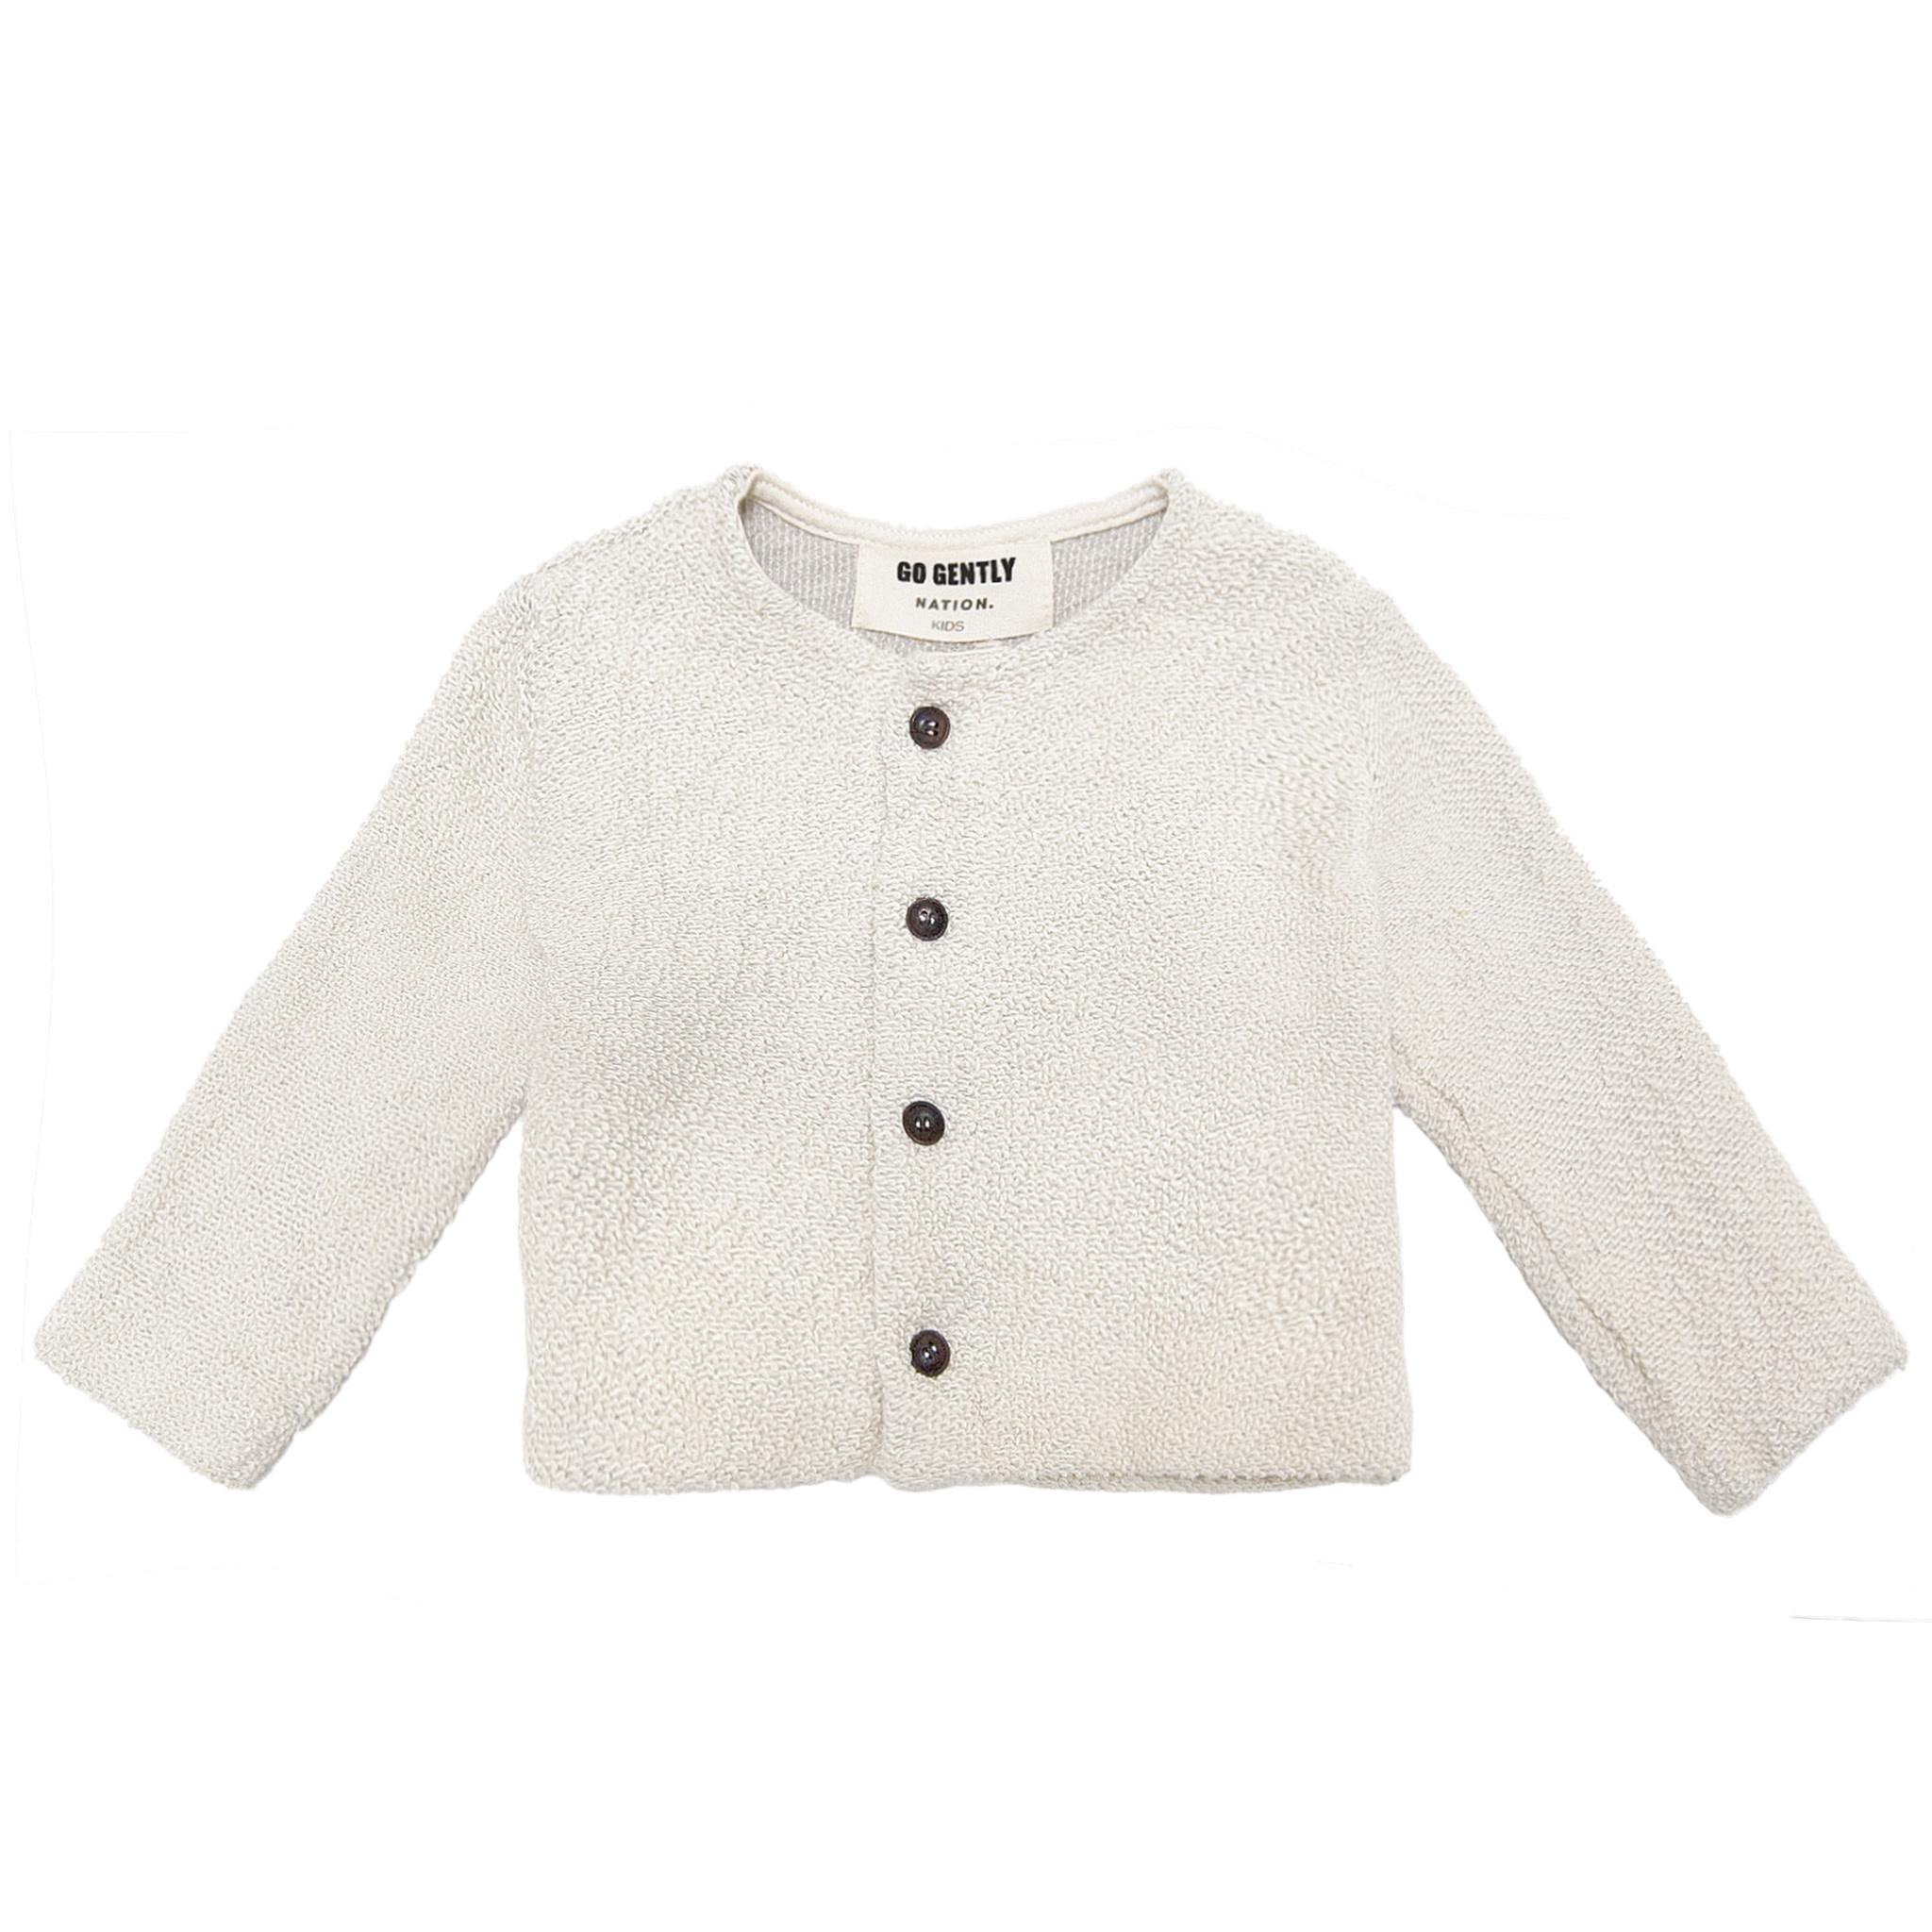 Go Gently Nation Natural Knit Coat